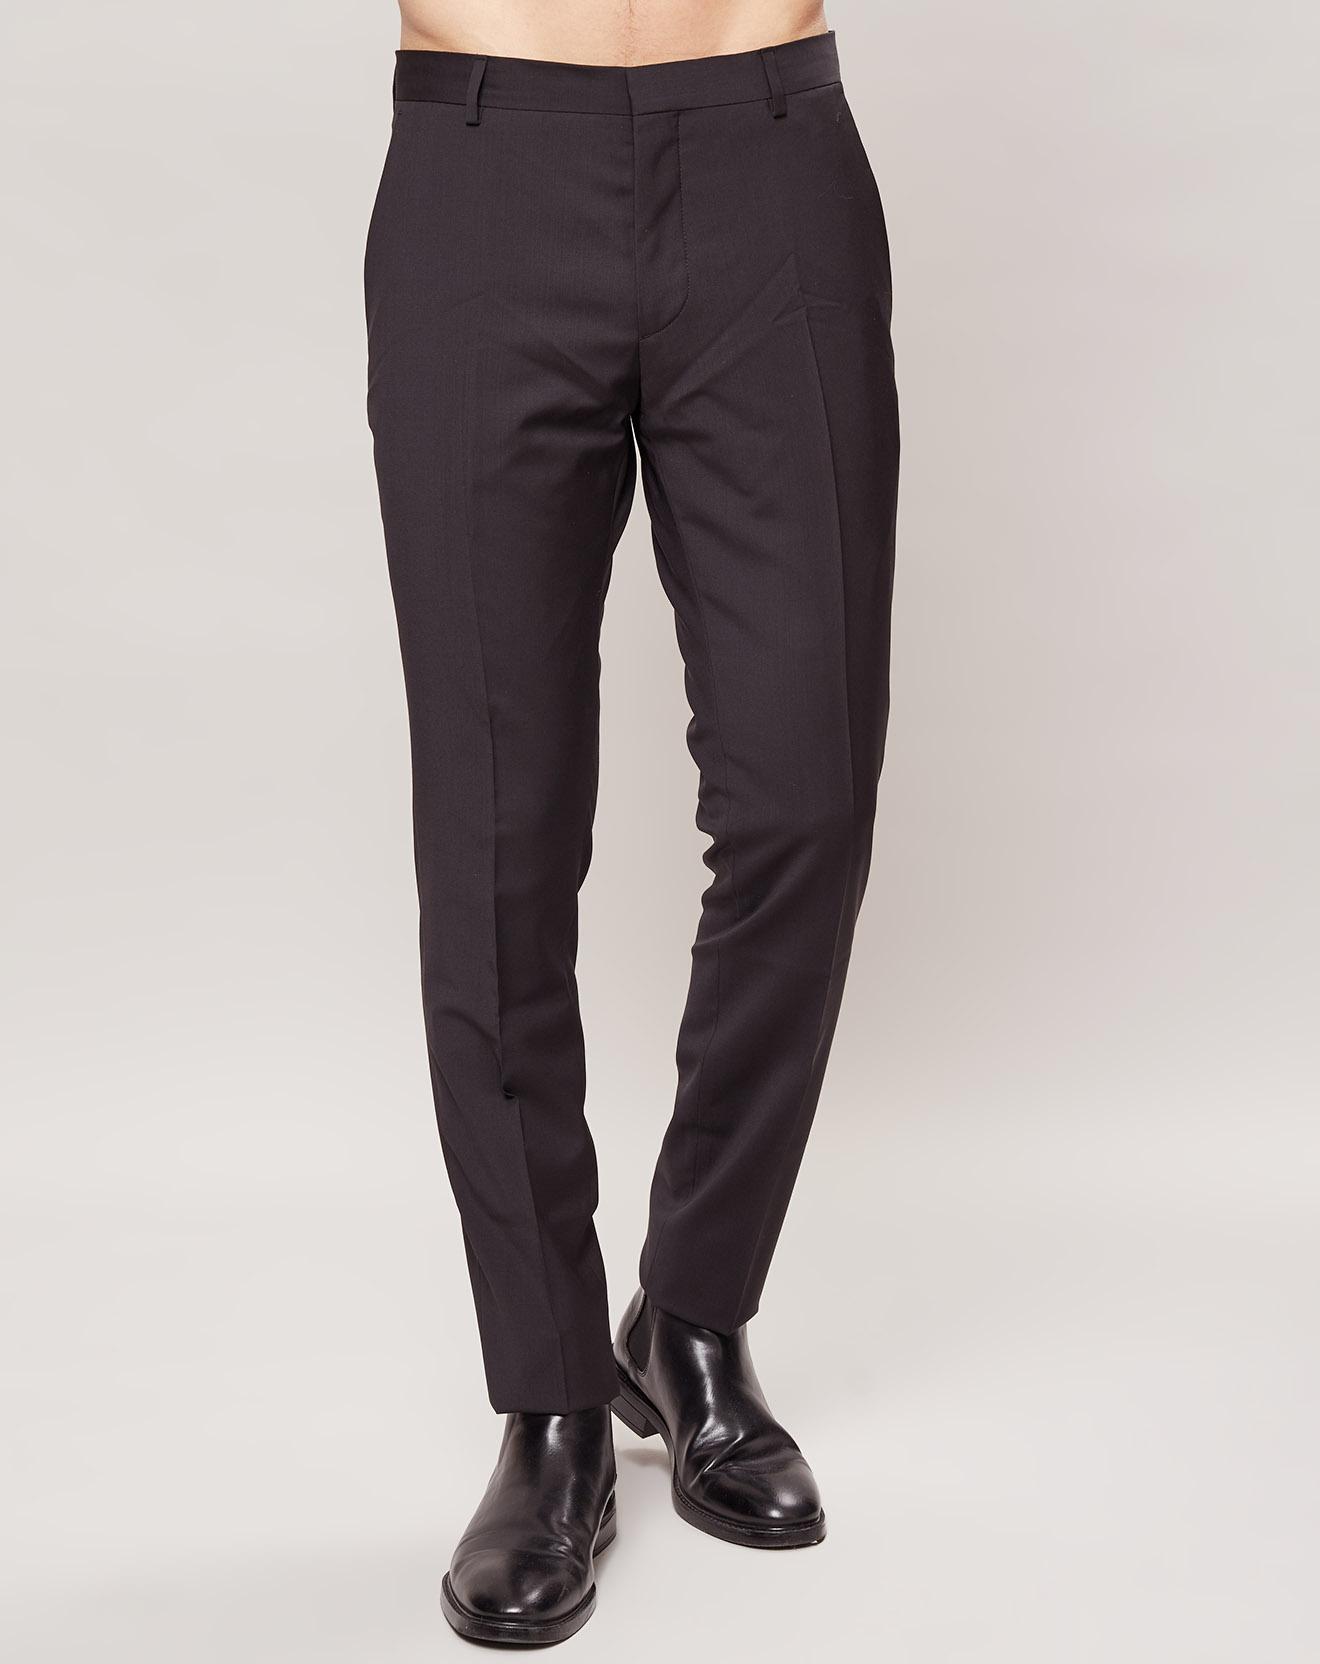 Pantalon 100% Laine Slim fit Pittsburgh-Bm - Calvin Klein - Modalova